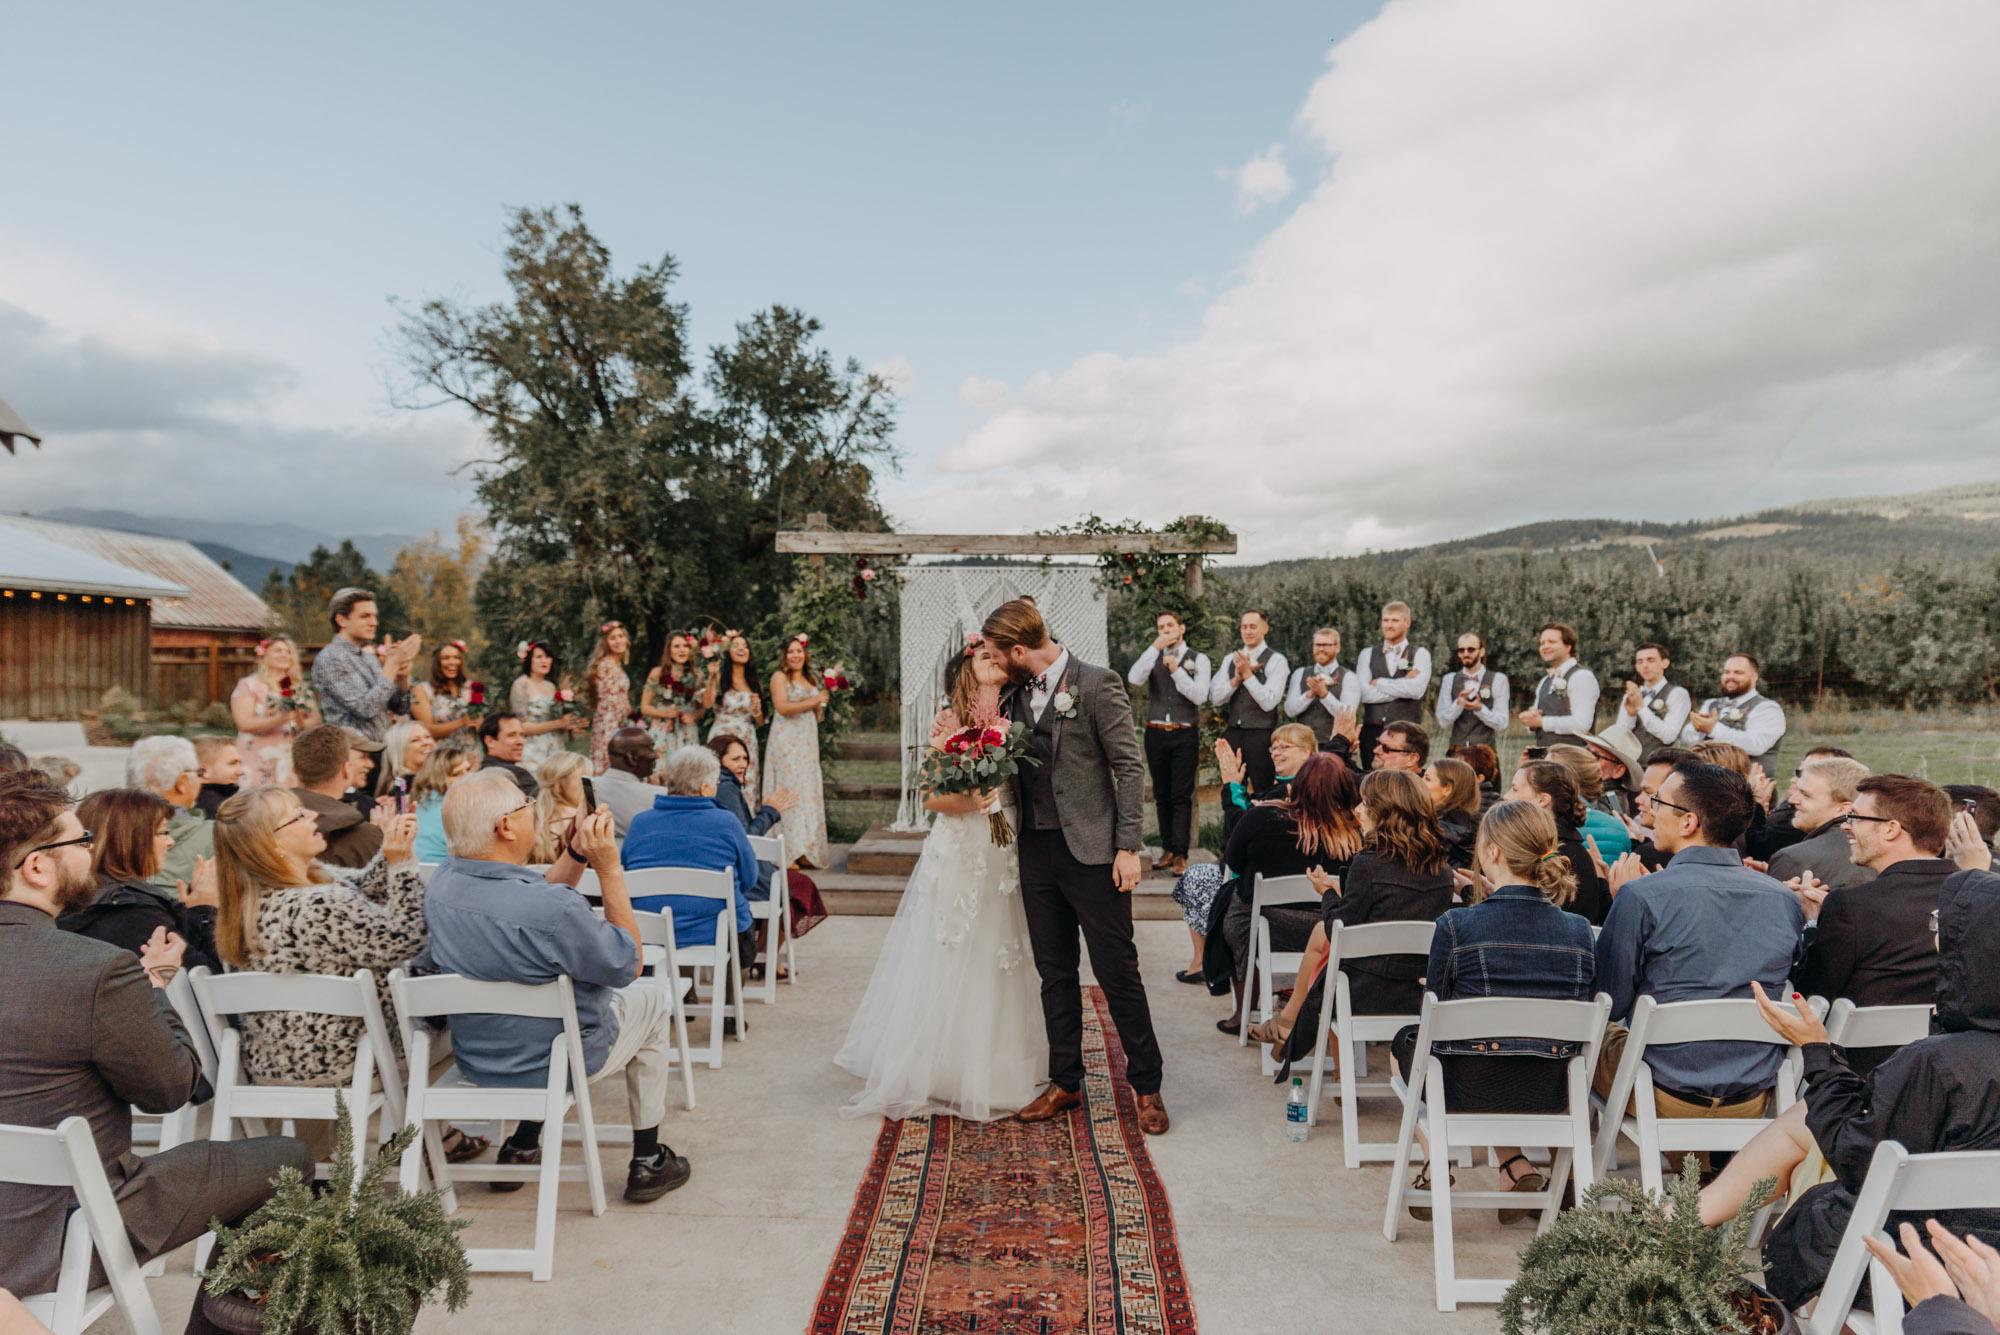 Outdoor-Summer-Ceremony-Washington-Wedding-Rainbow-5440.jpg